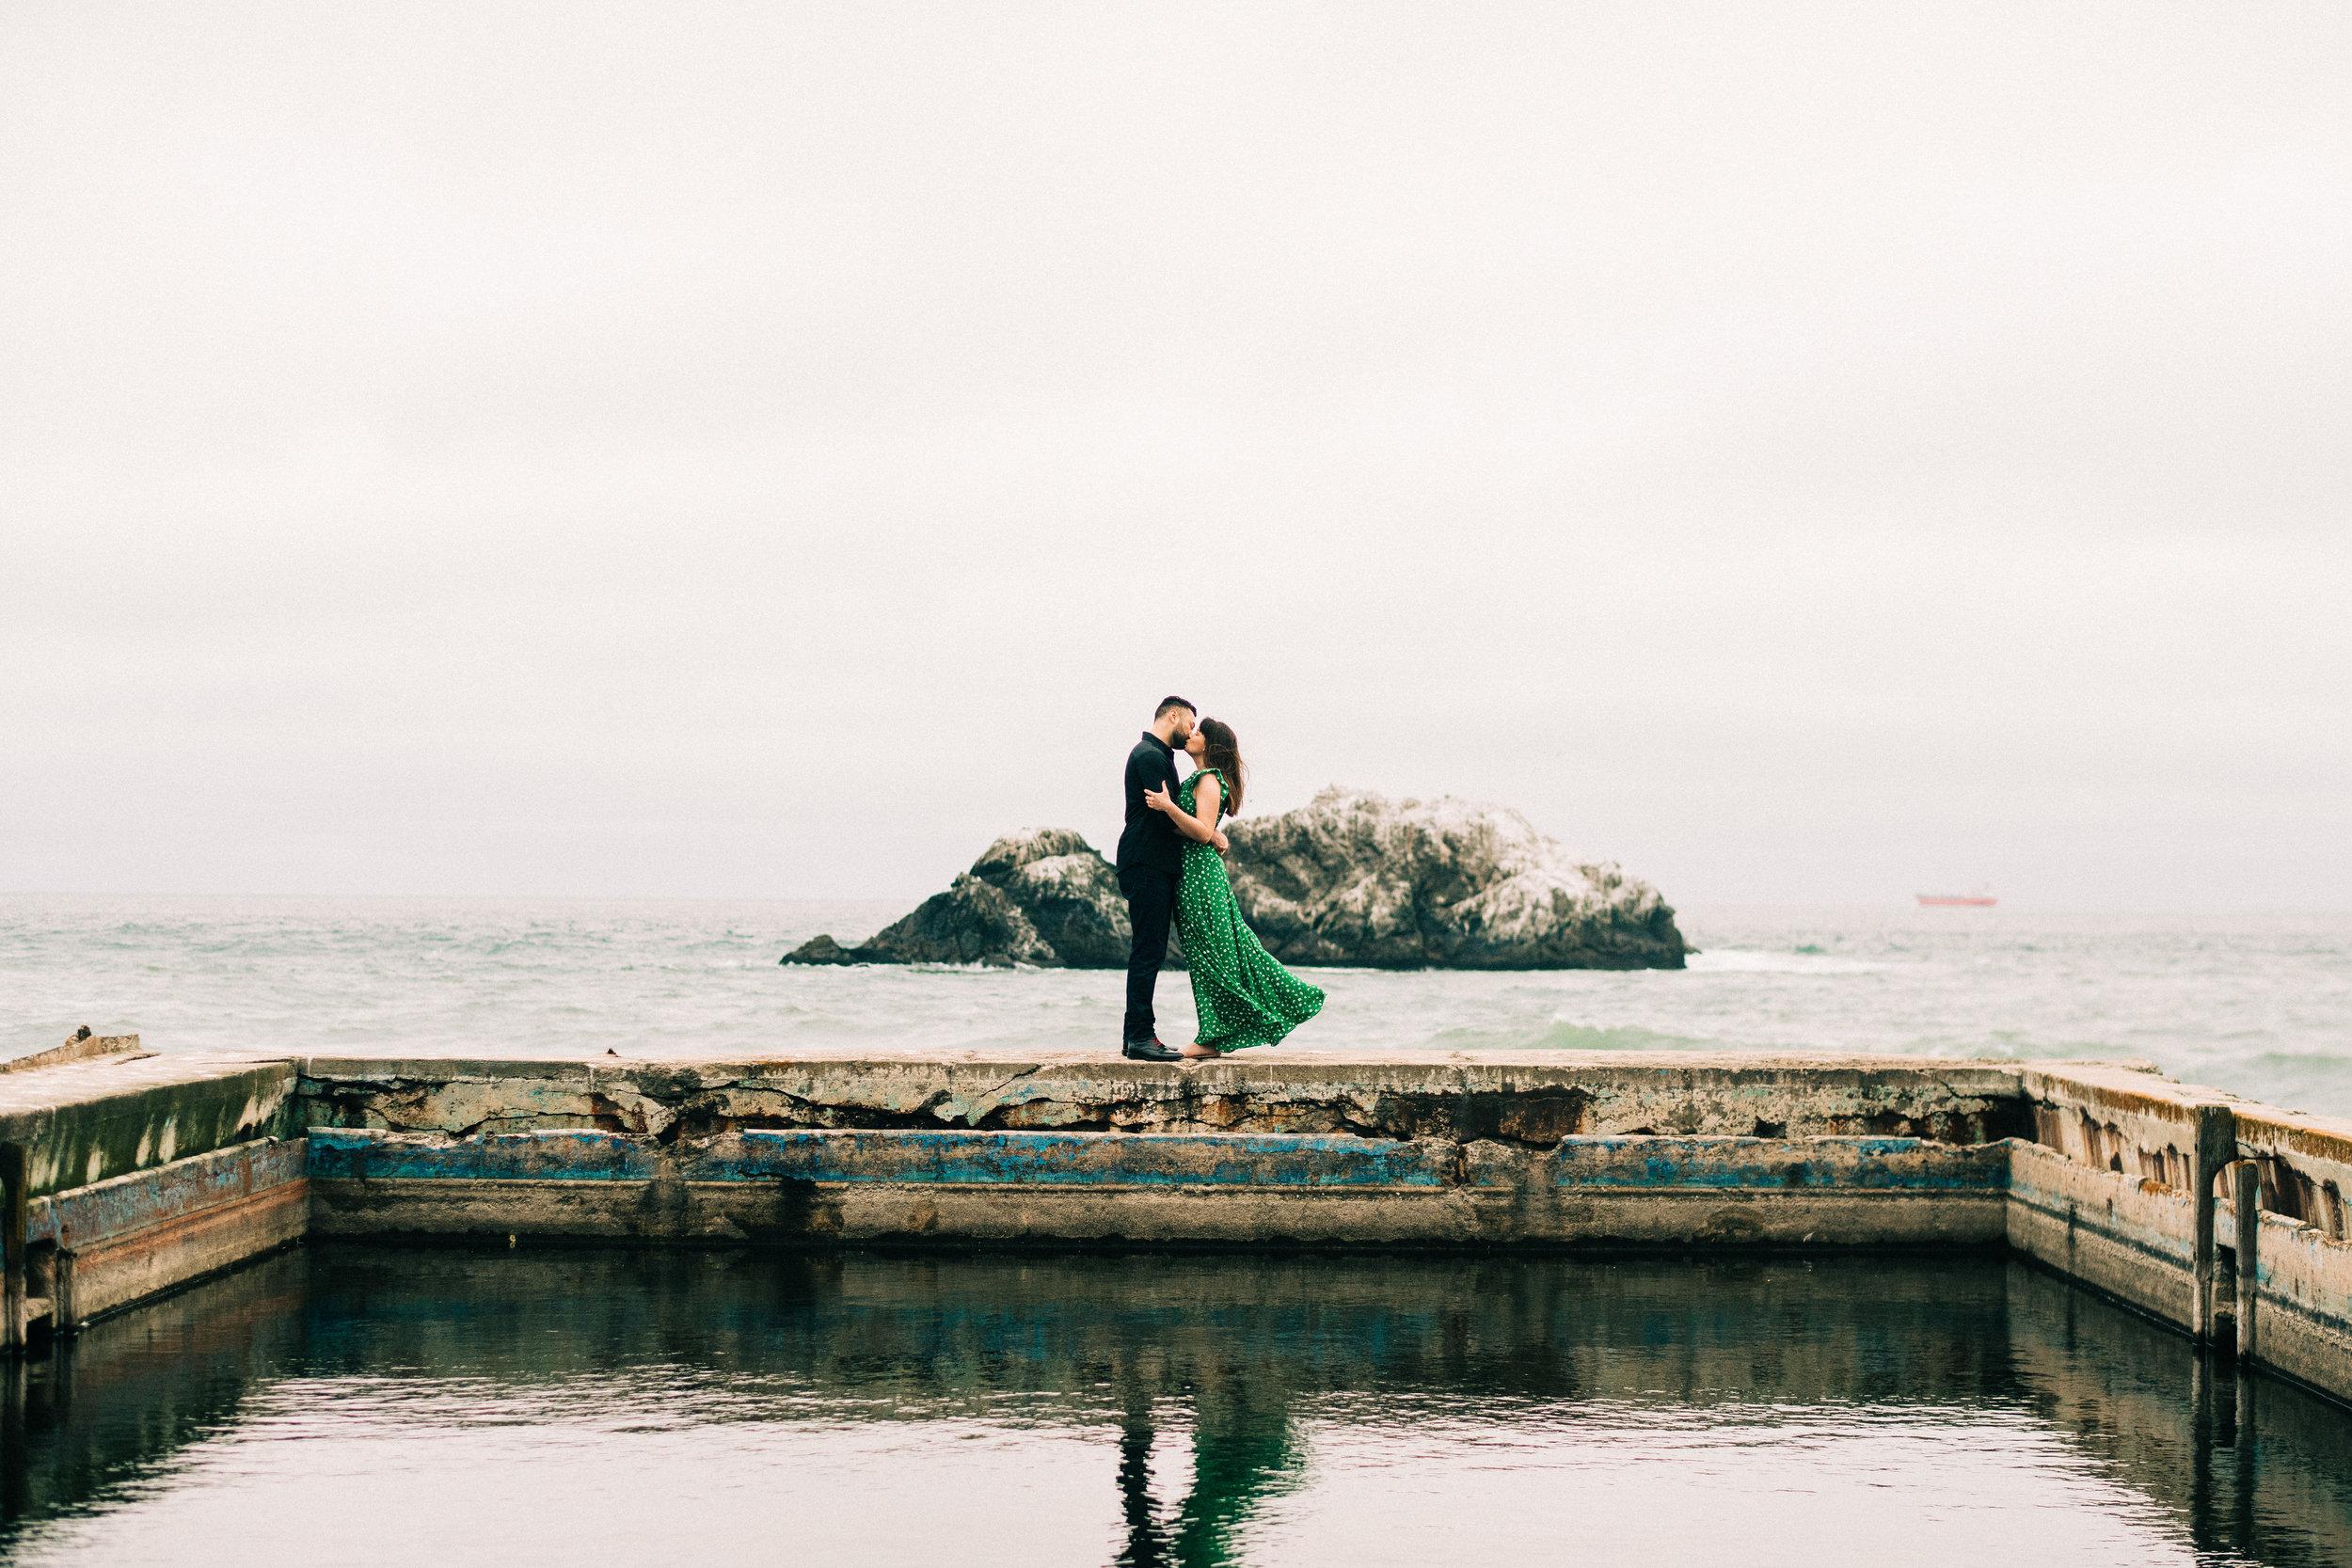 bay area lands end sutro baths oakland san francisco engagement wedding nontraditional fun creative eclectic photographer magic-262.jpg